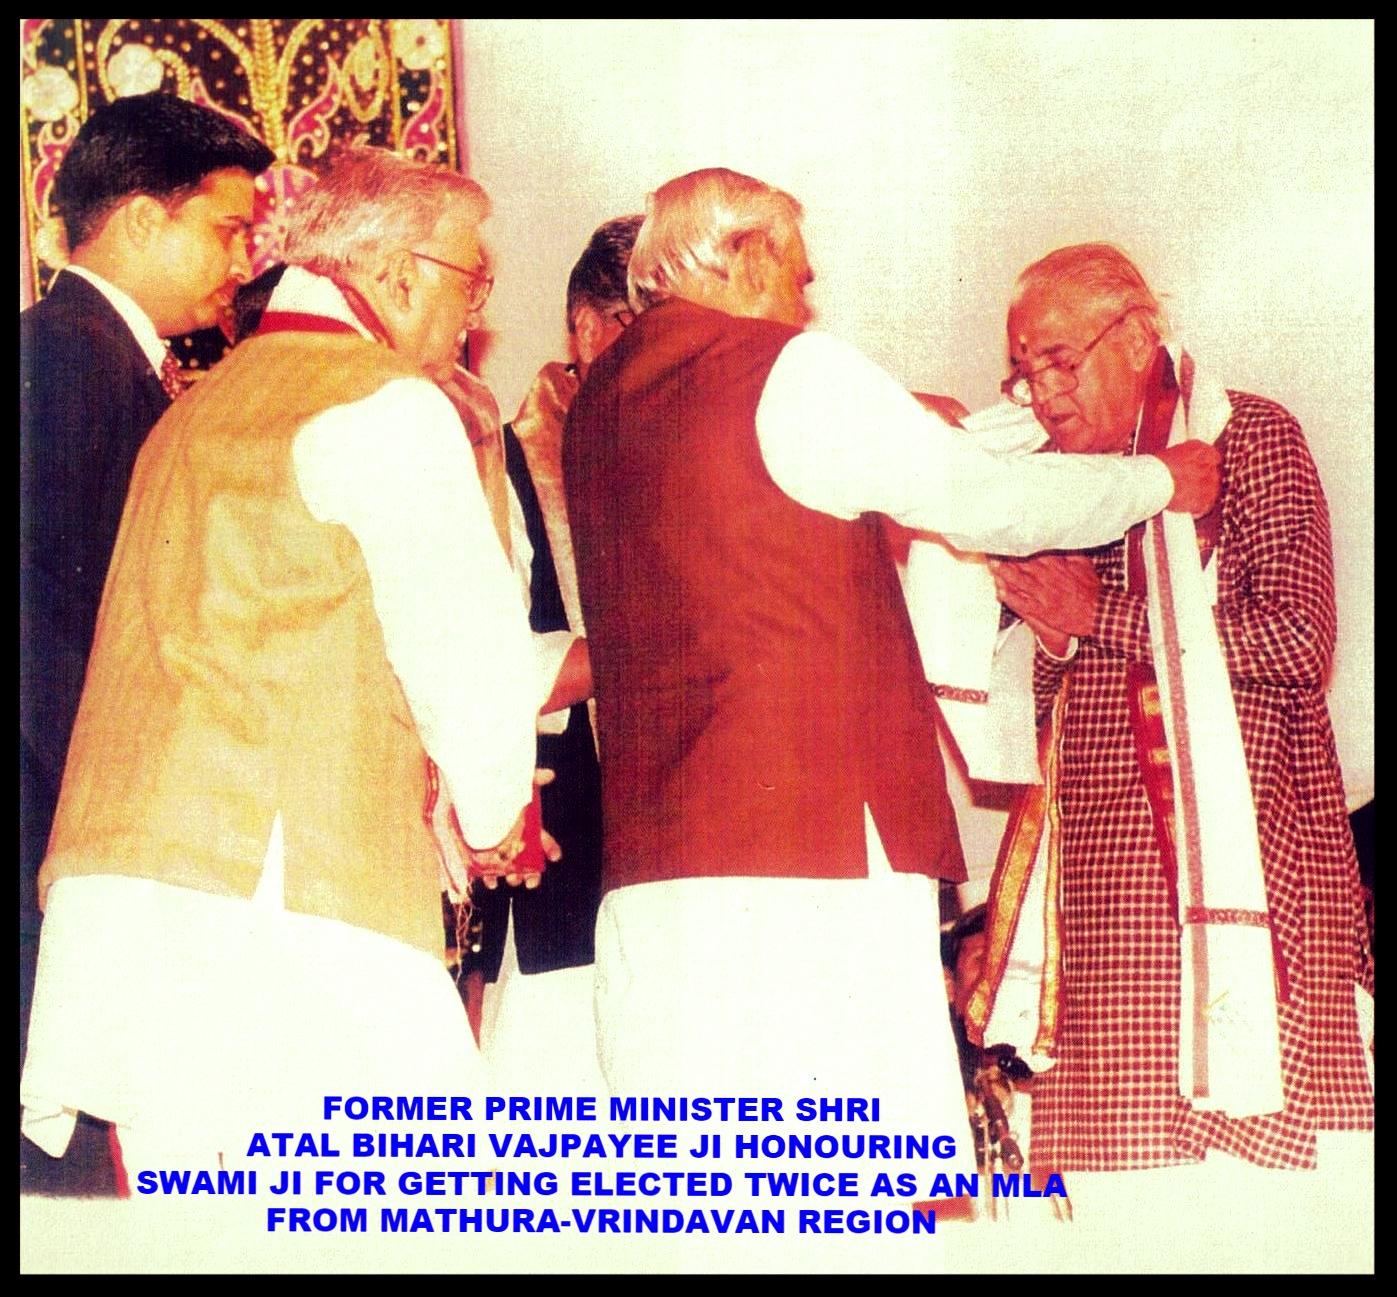 Swami Ram Swaroop Sharma